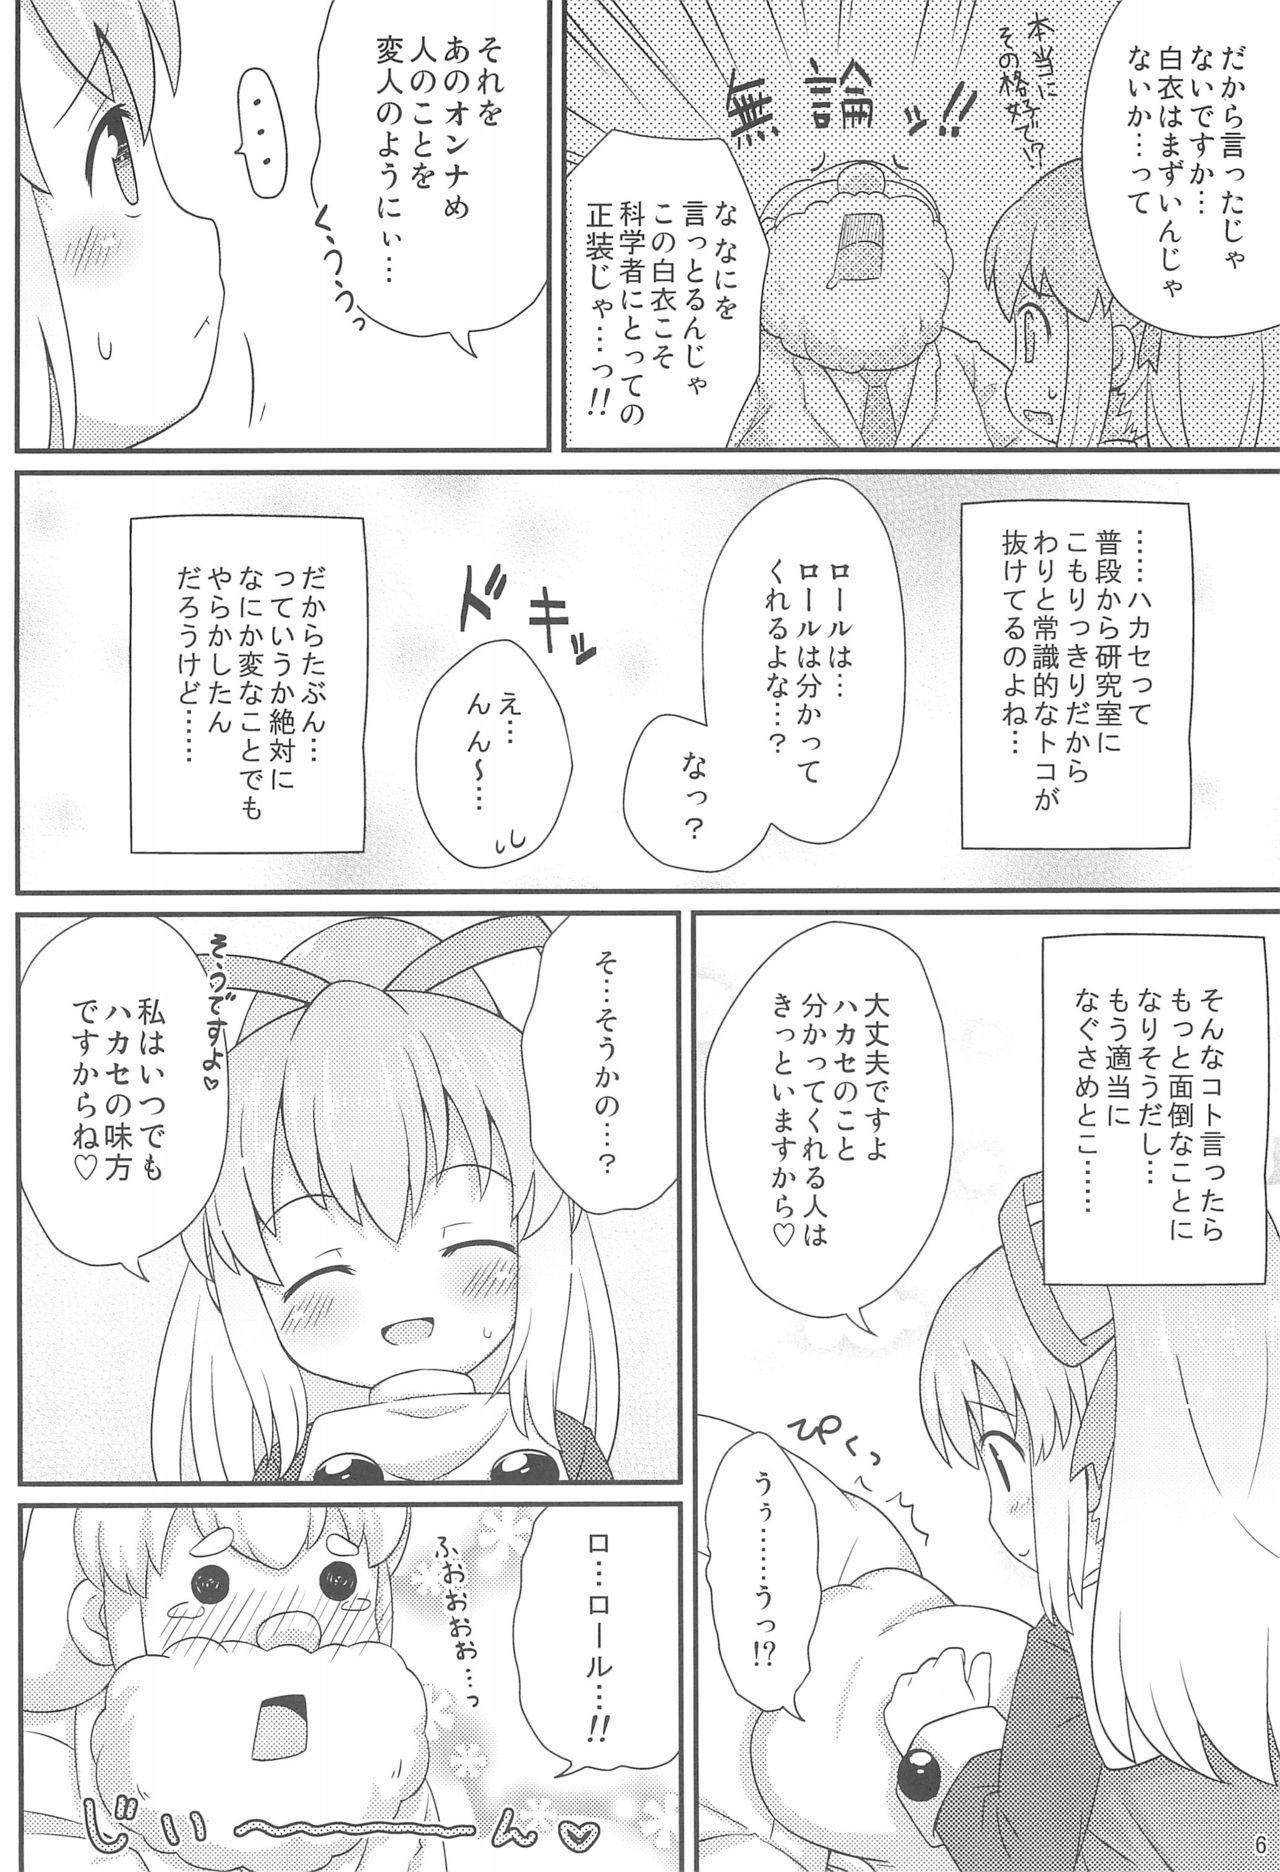 Roll-chan Onegaishimasu 5